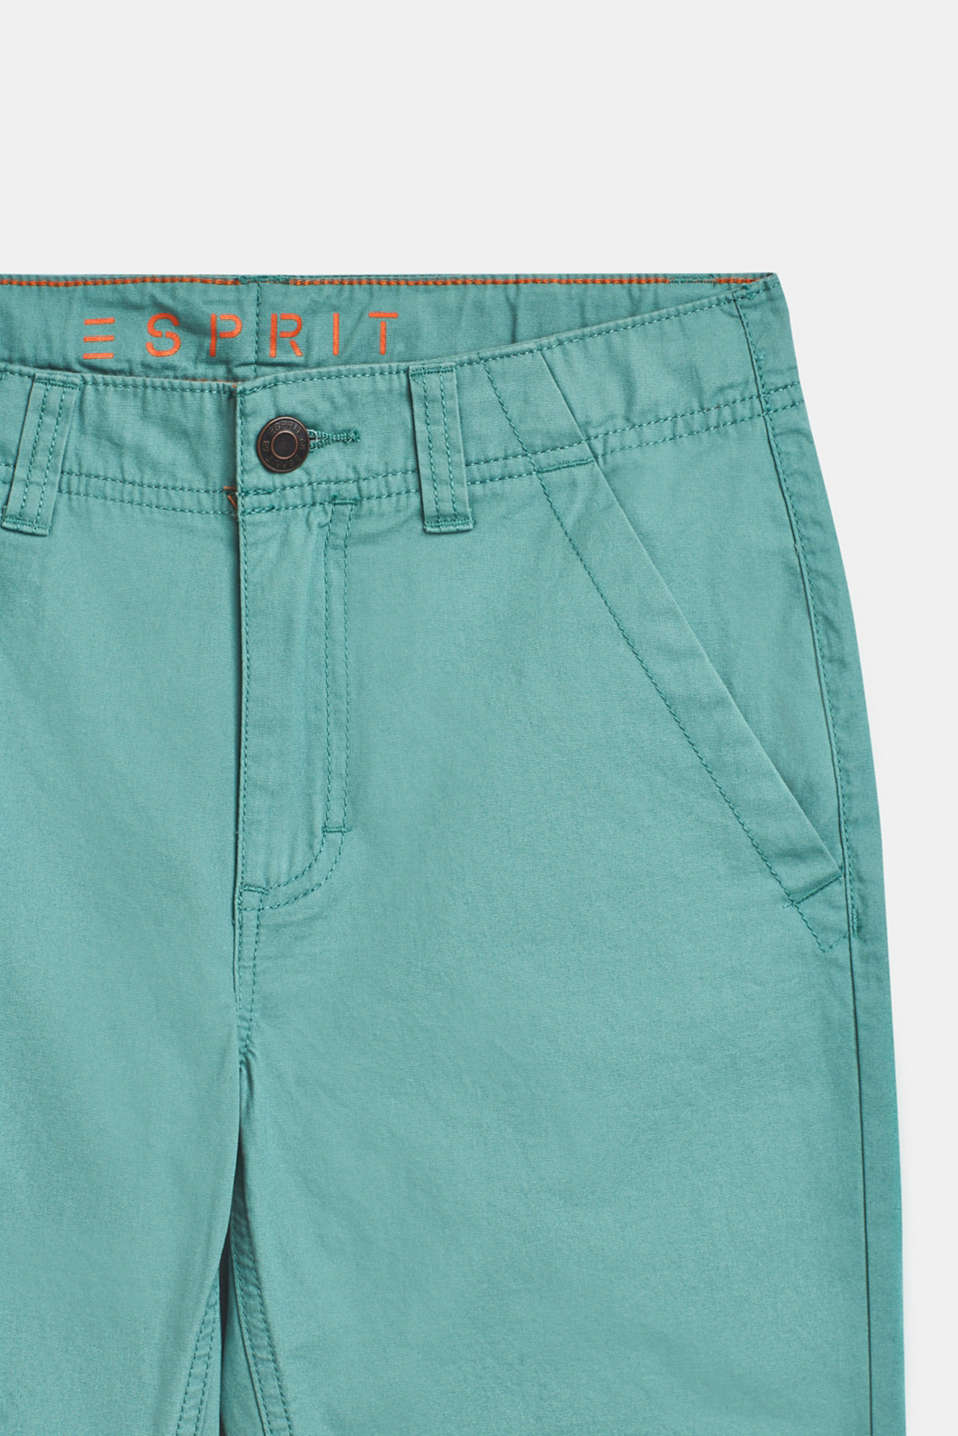 Bermuda shorts in 100% cotton, LCSOFT GREEN, detail image number 2